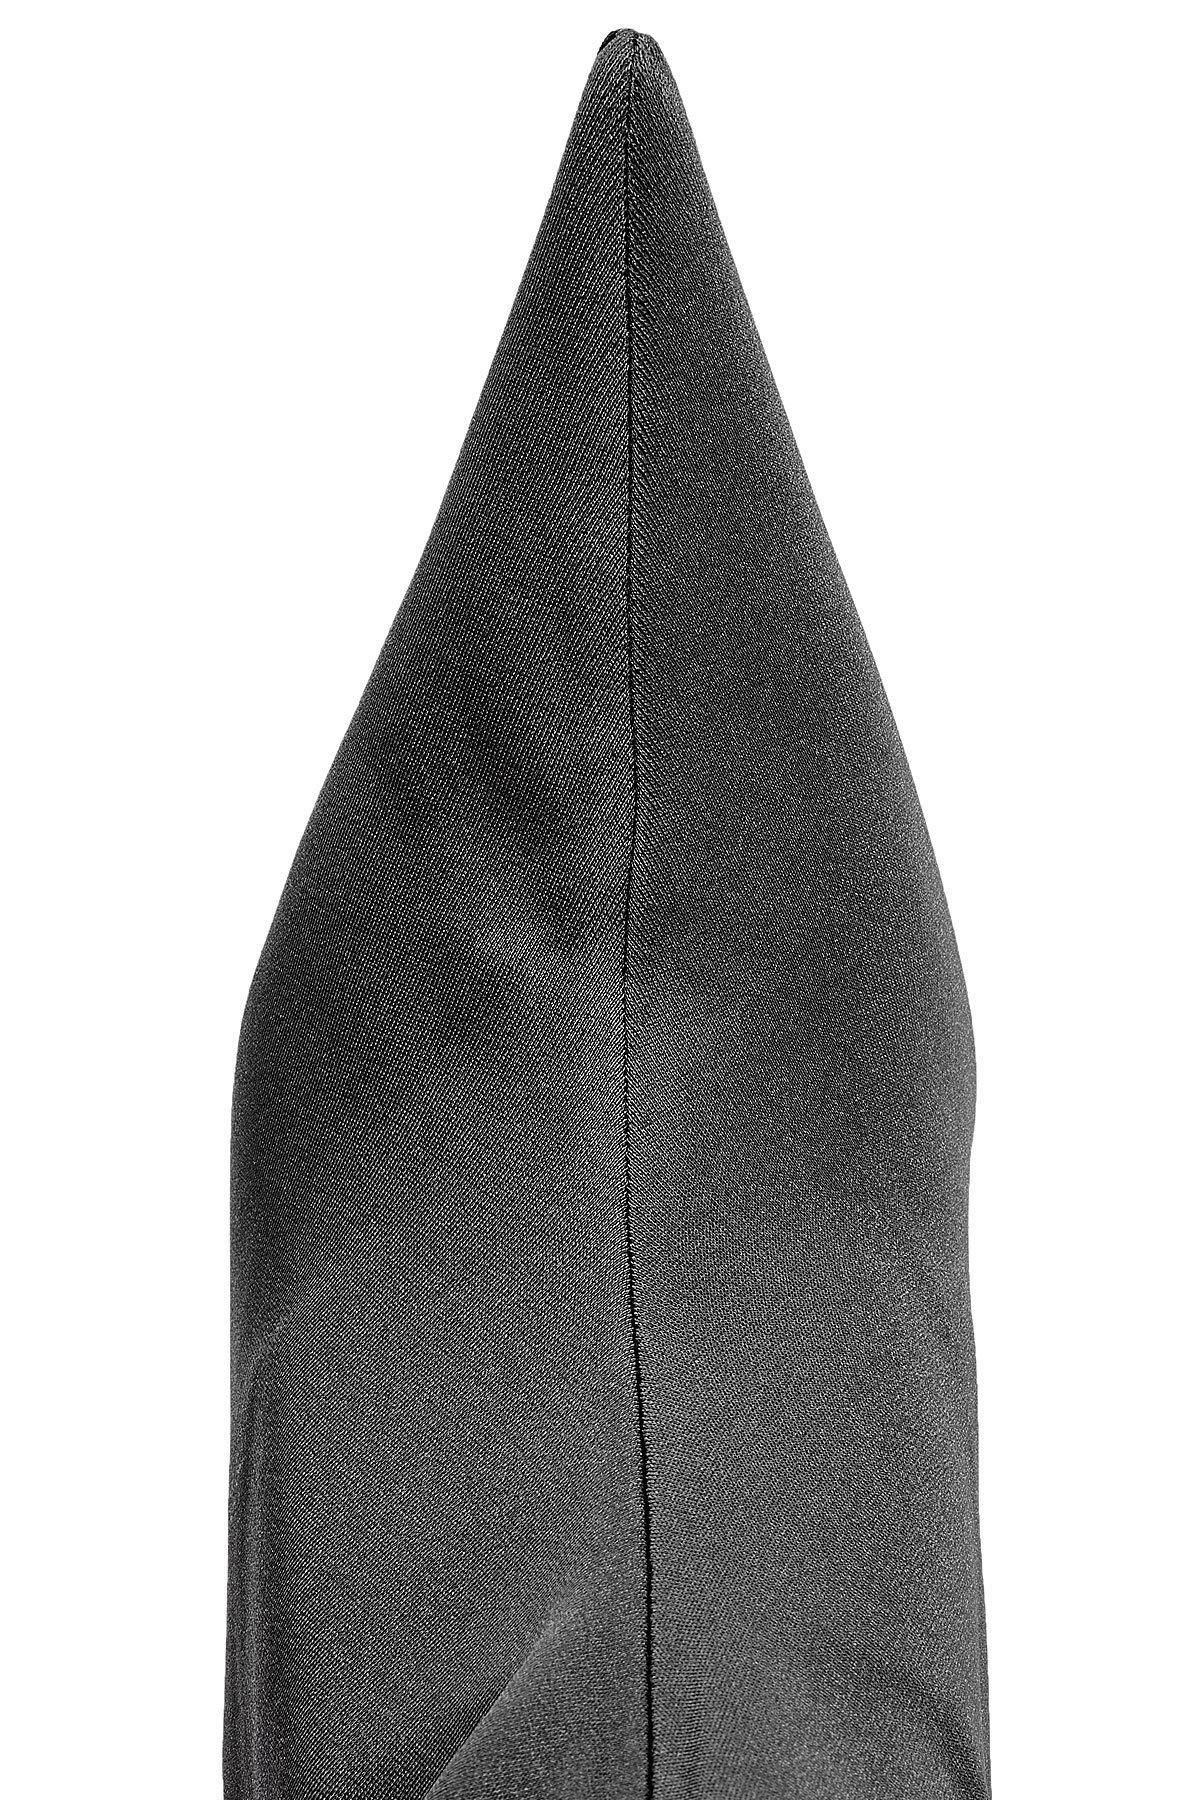 0d90dda5cf90 Balenciaga - Black Thigh-high Stiletto Boots - Lyst. View fullscreen